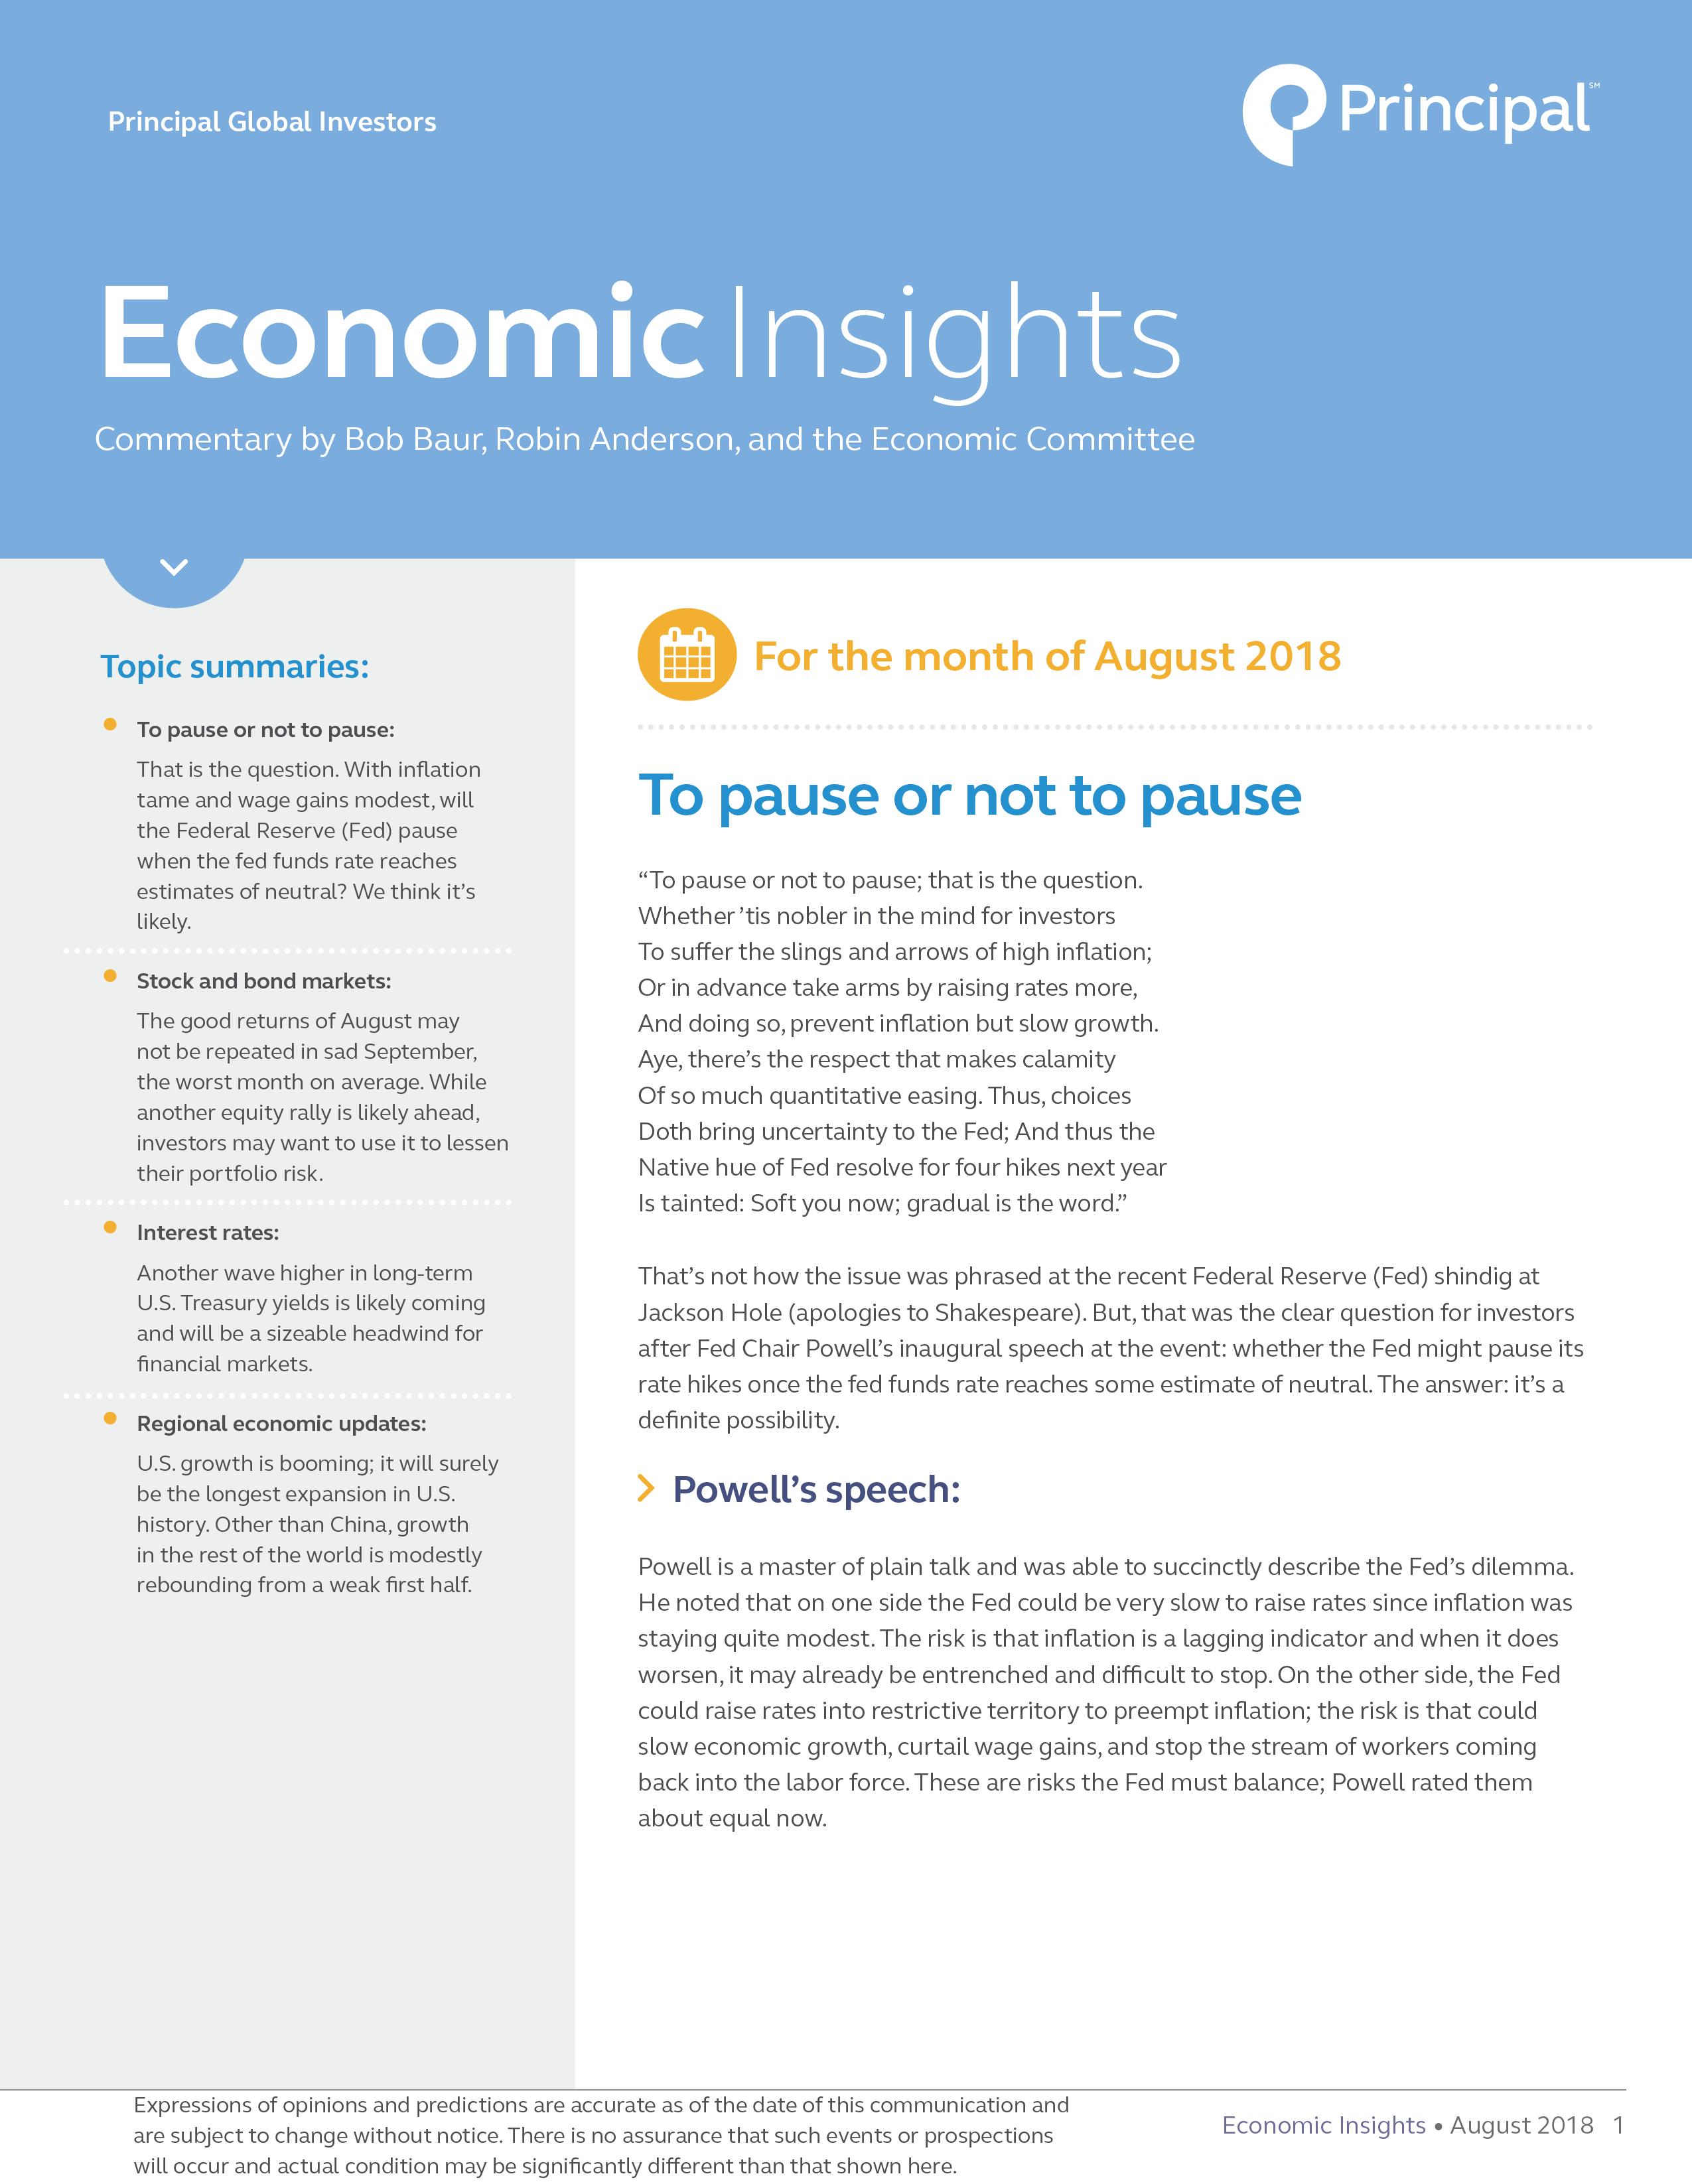 EI month of August